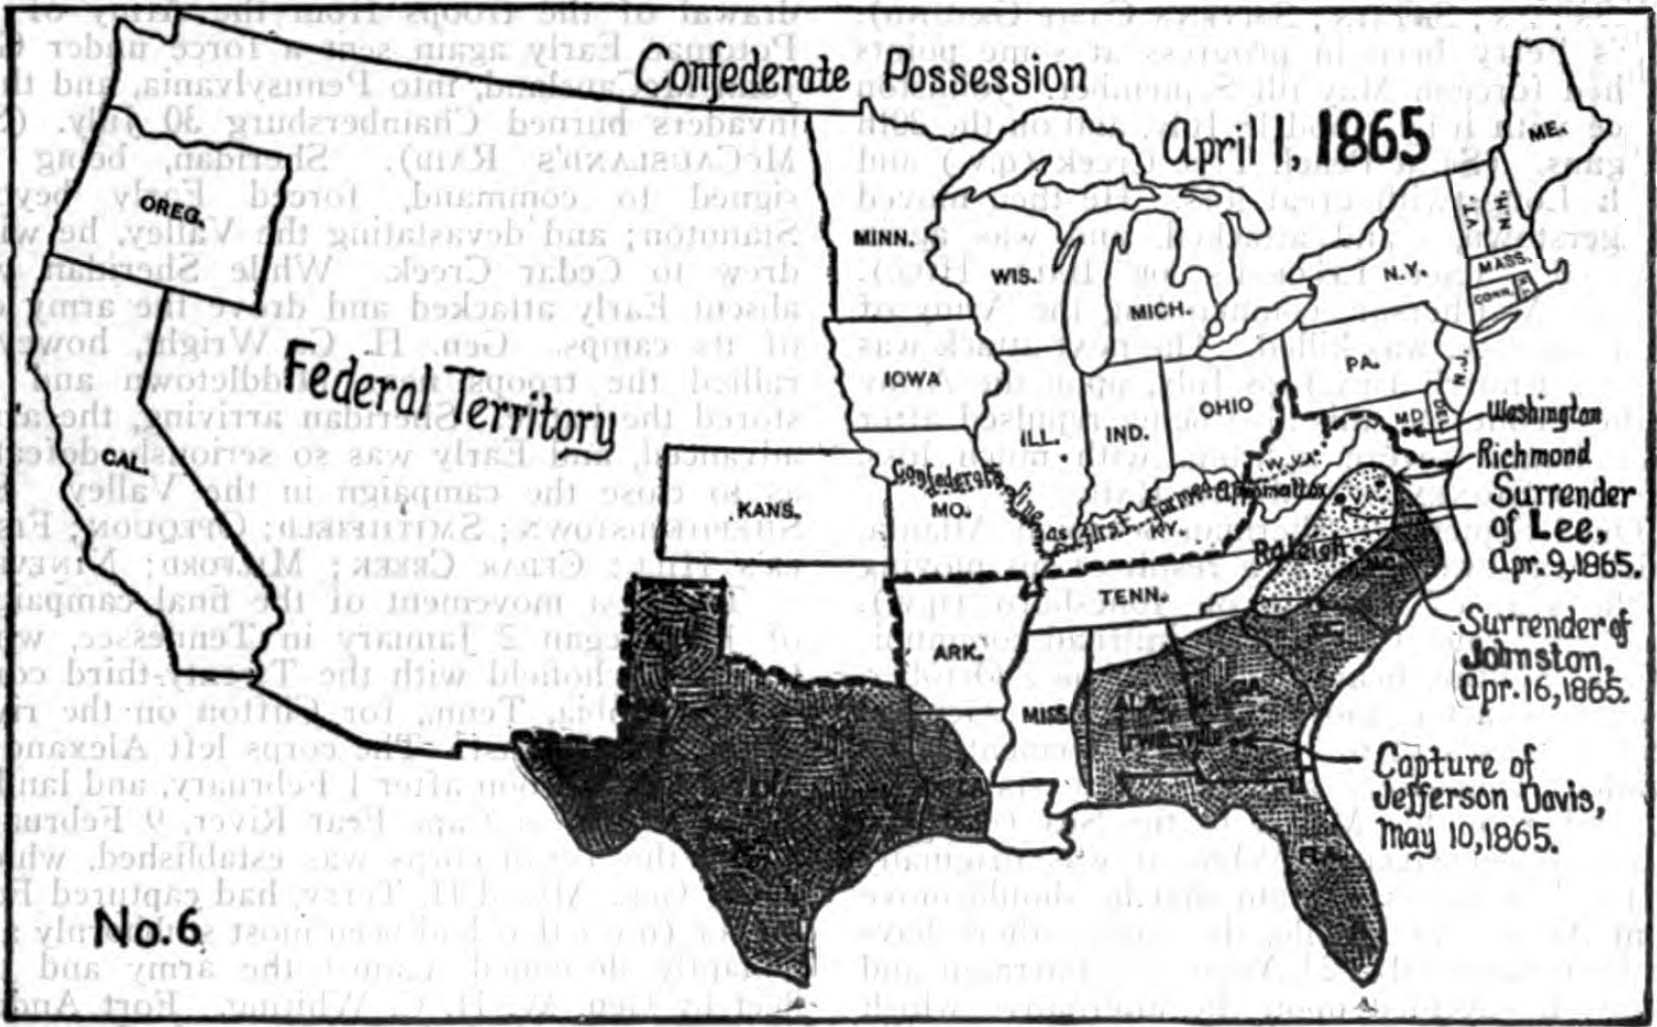 FileAmericana Civil War in America  Map 6jpg  Wikimedia Commons